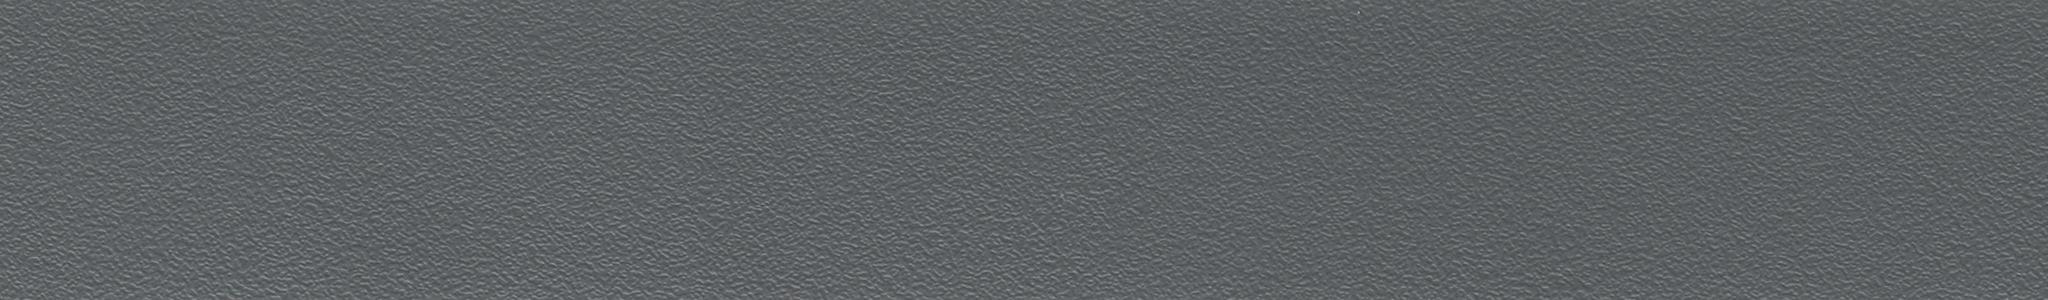 HU 17815 кромка ABS серая жемчуг XG